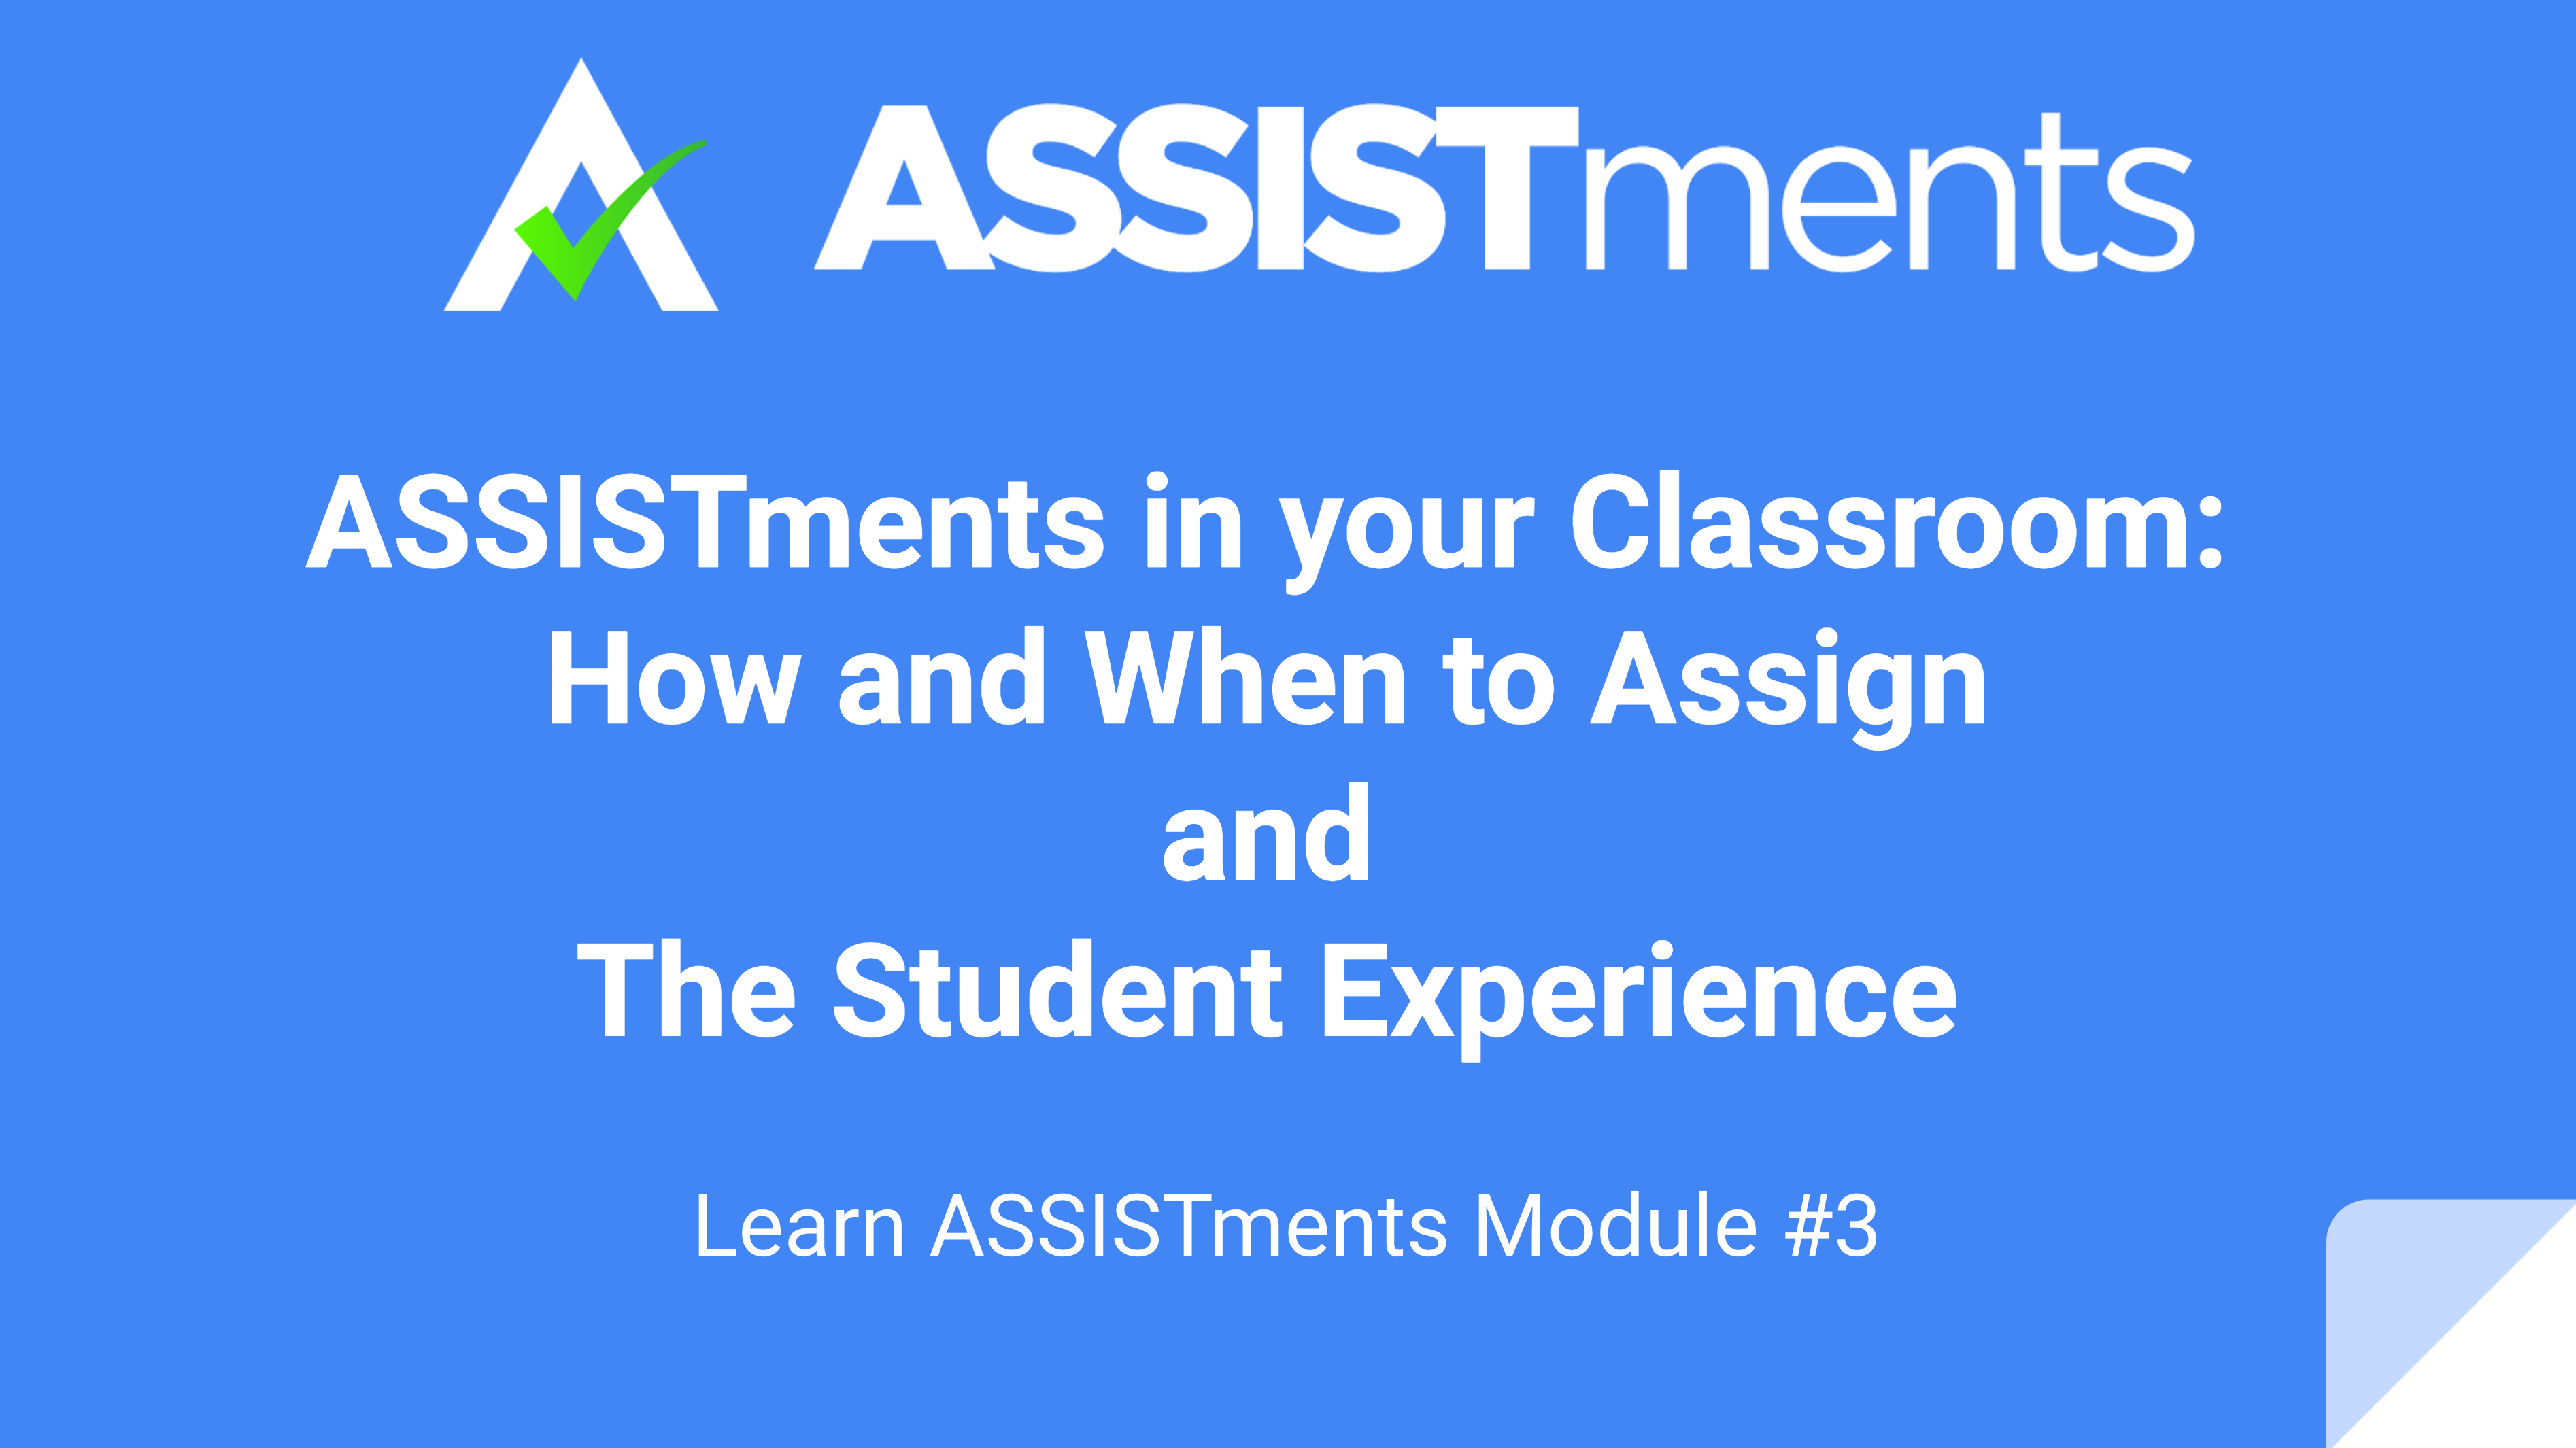 Learn ASSISTments Module #3